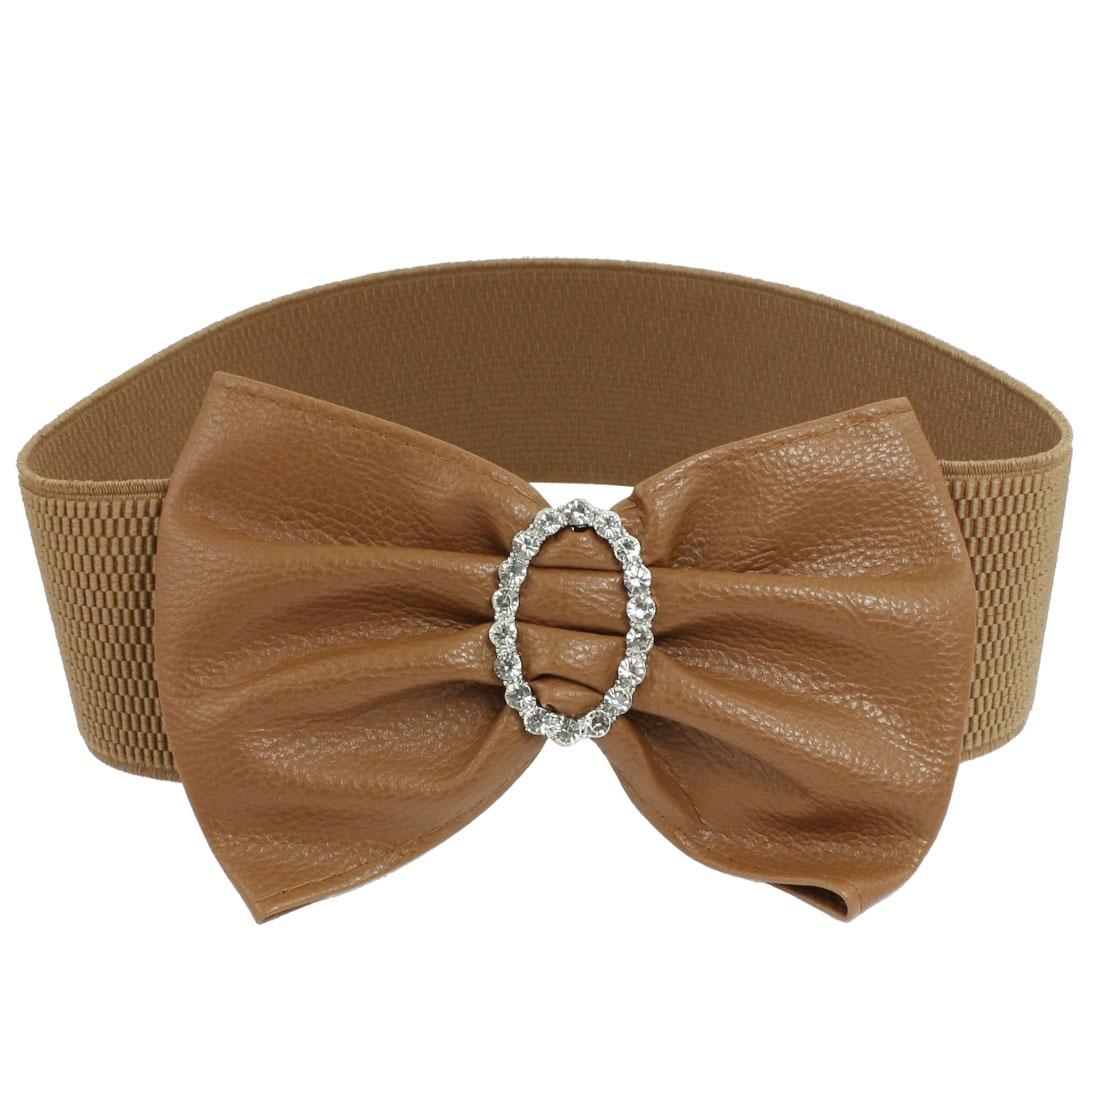 "Brown Faux Leather Bowknot Press Button Buckle 2.4"" Width Cinch Belt"